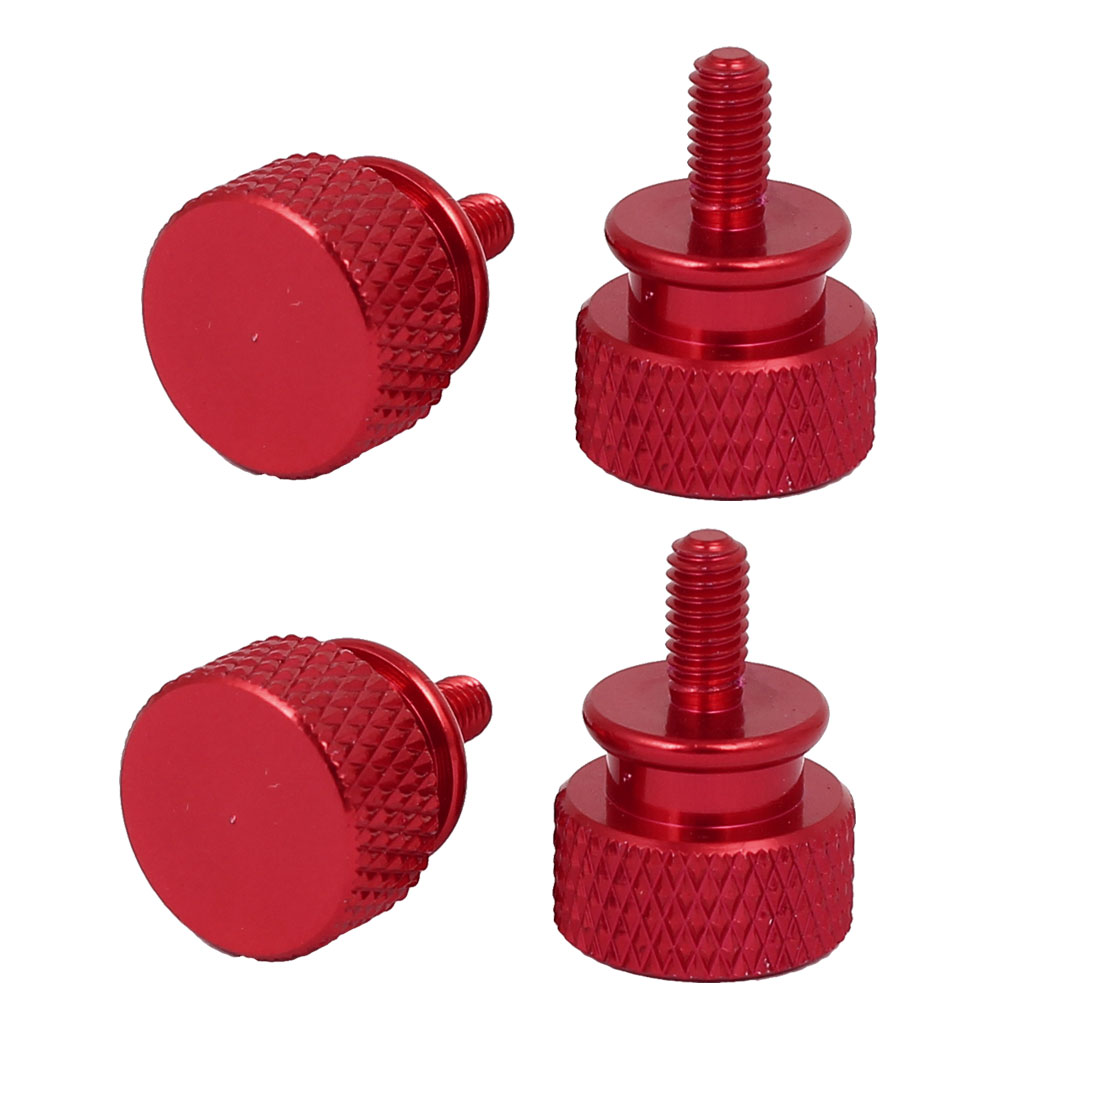 Computer-PC-Case-Aluminum-Alloy-Knurled-Thumb-Screws-M3x7mm-4pcs